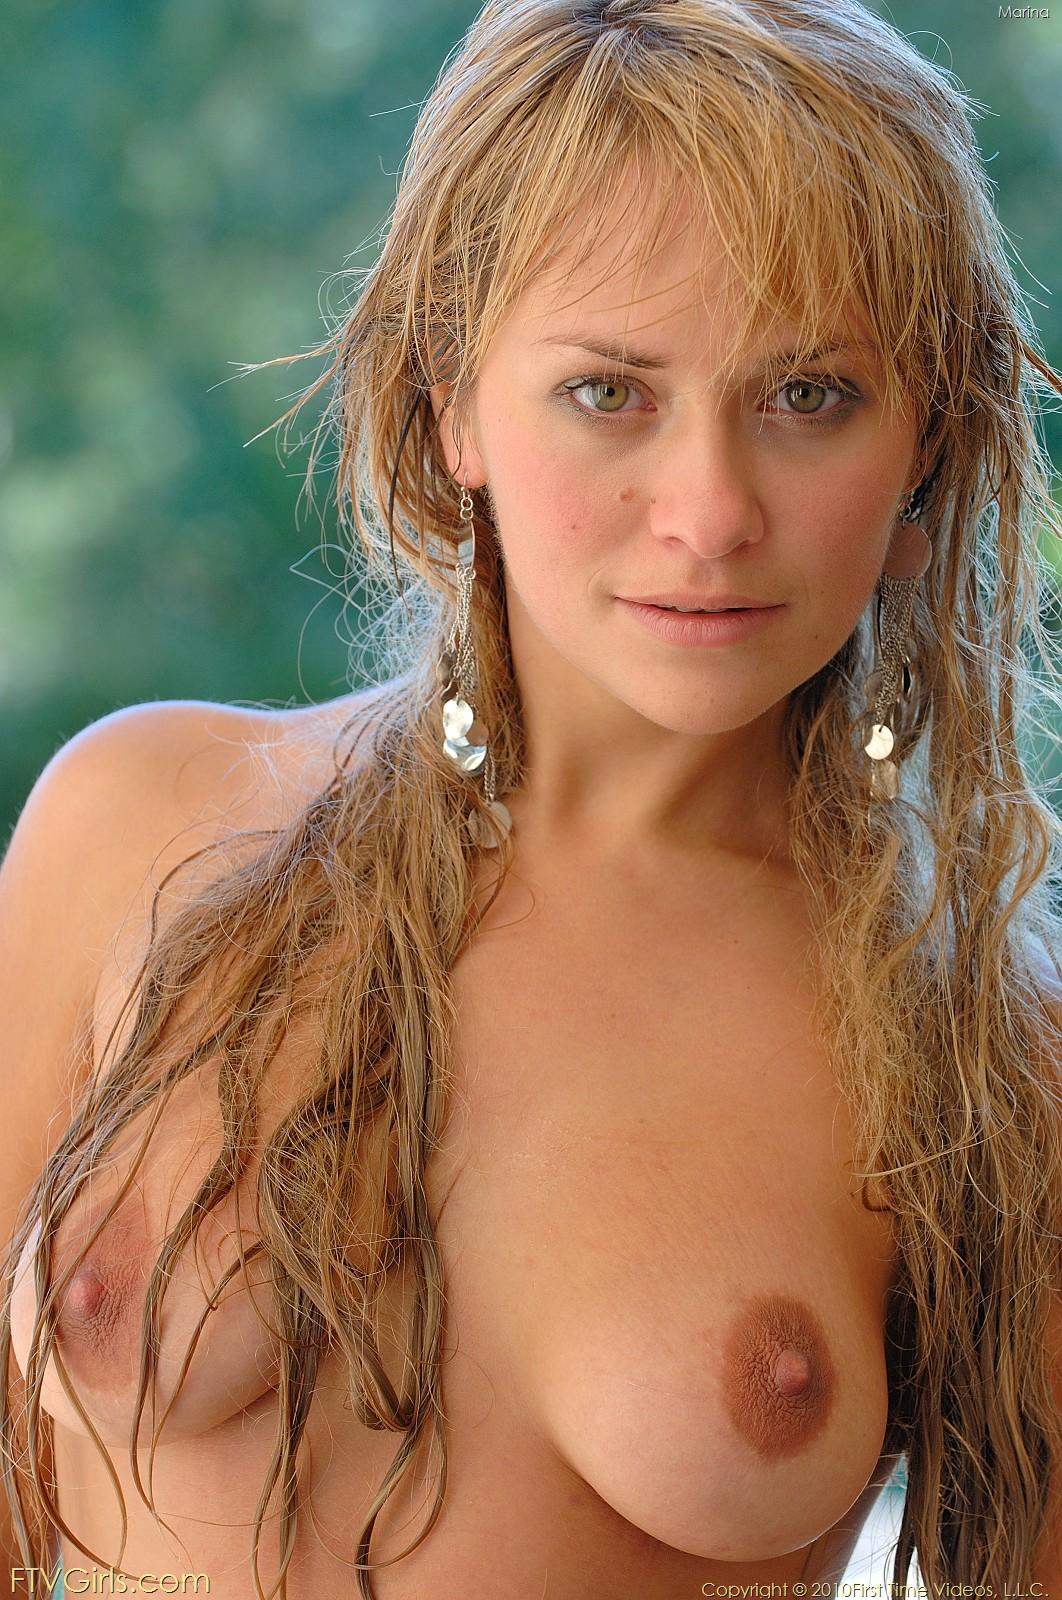 wpid-marina-shows-off-her-sweet-tits5.jpg